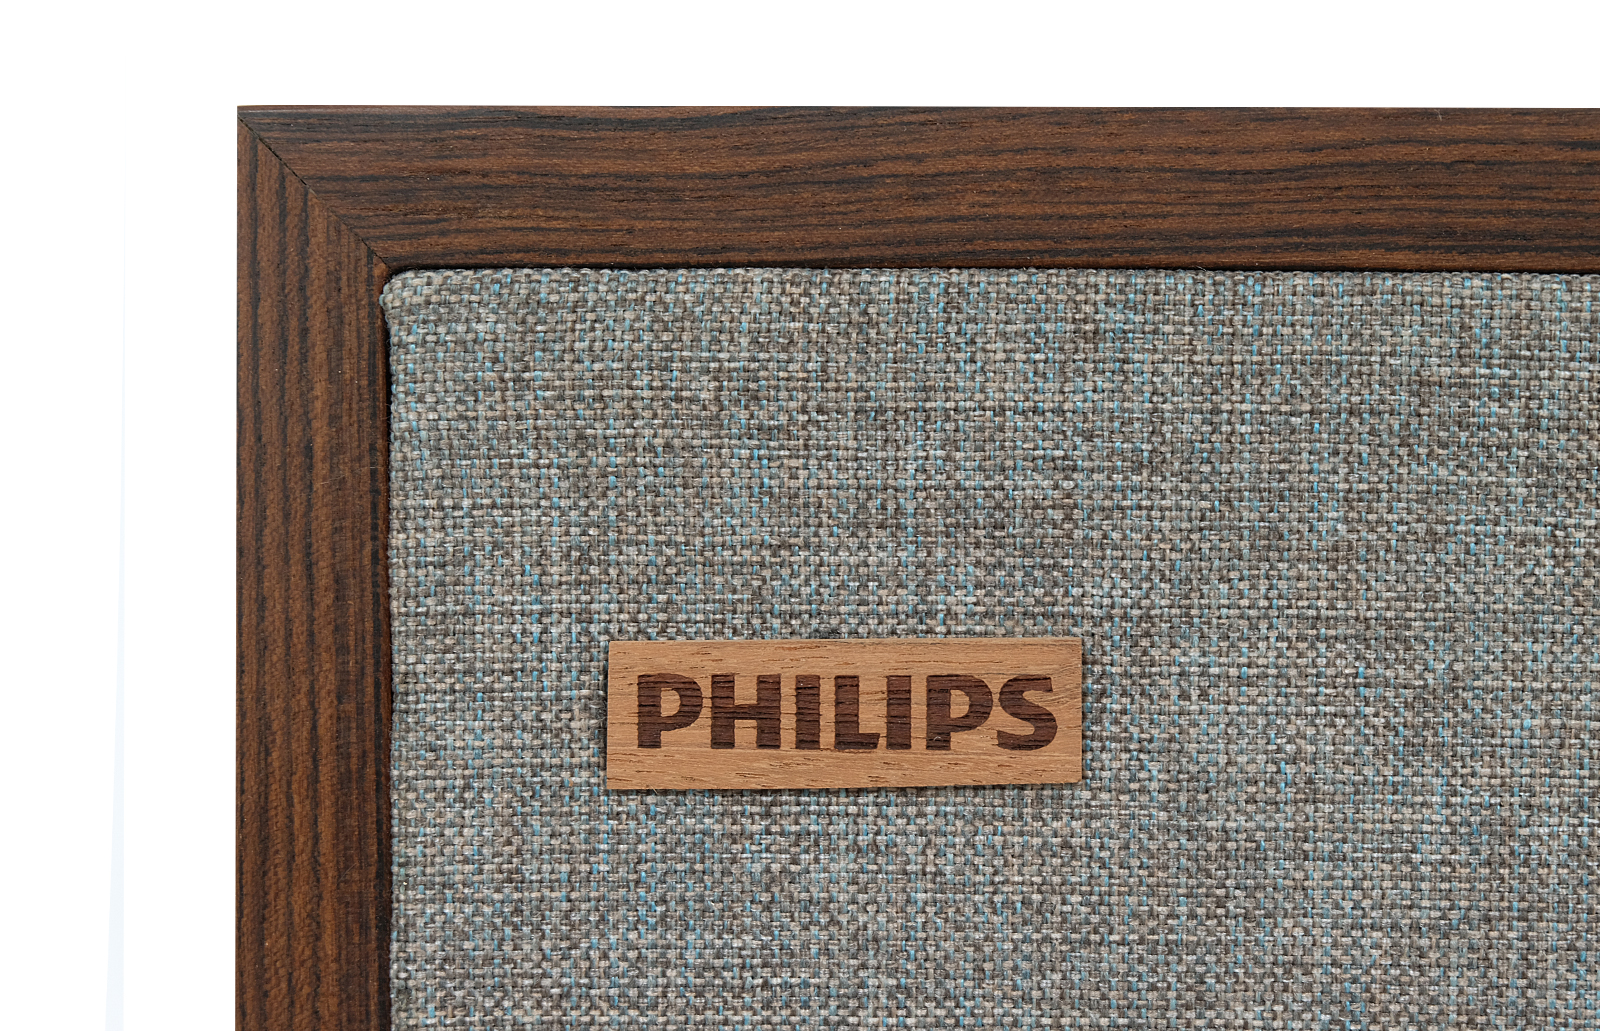 PHILIPS 22RH496